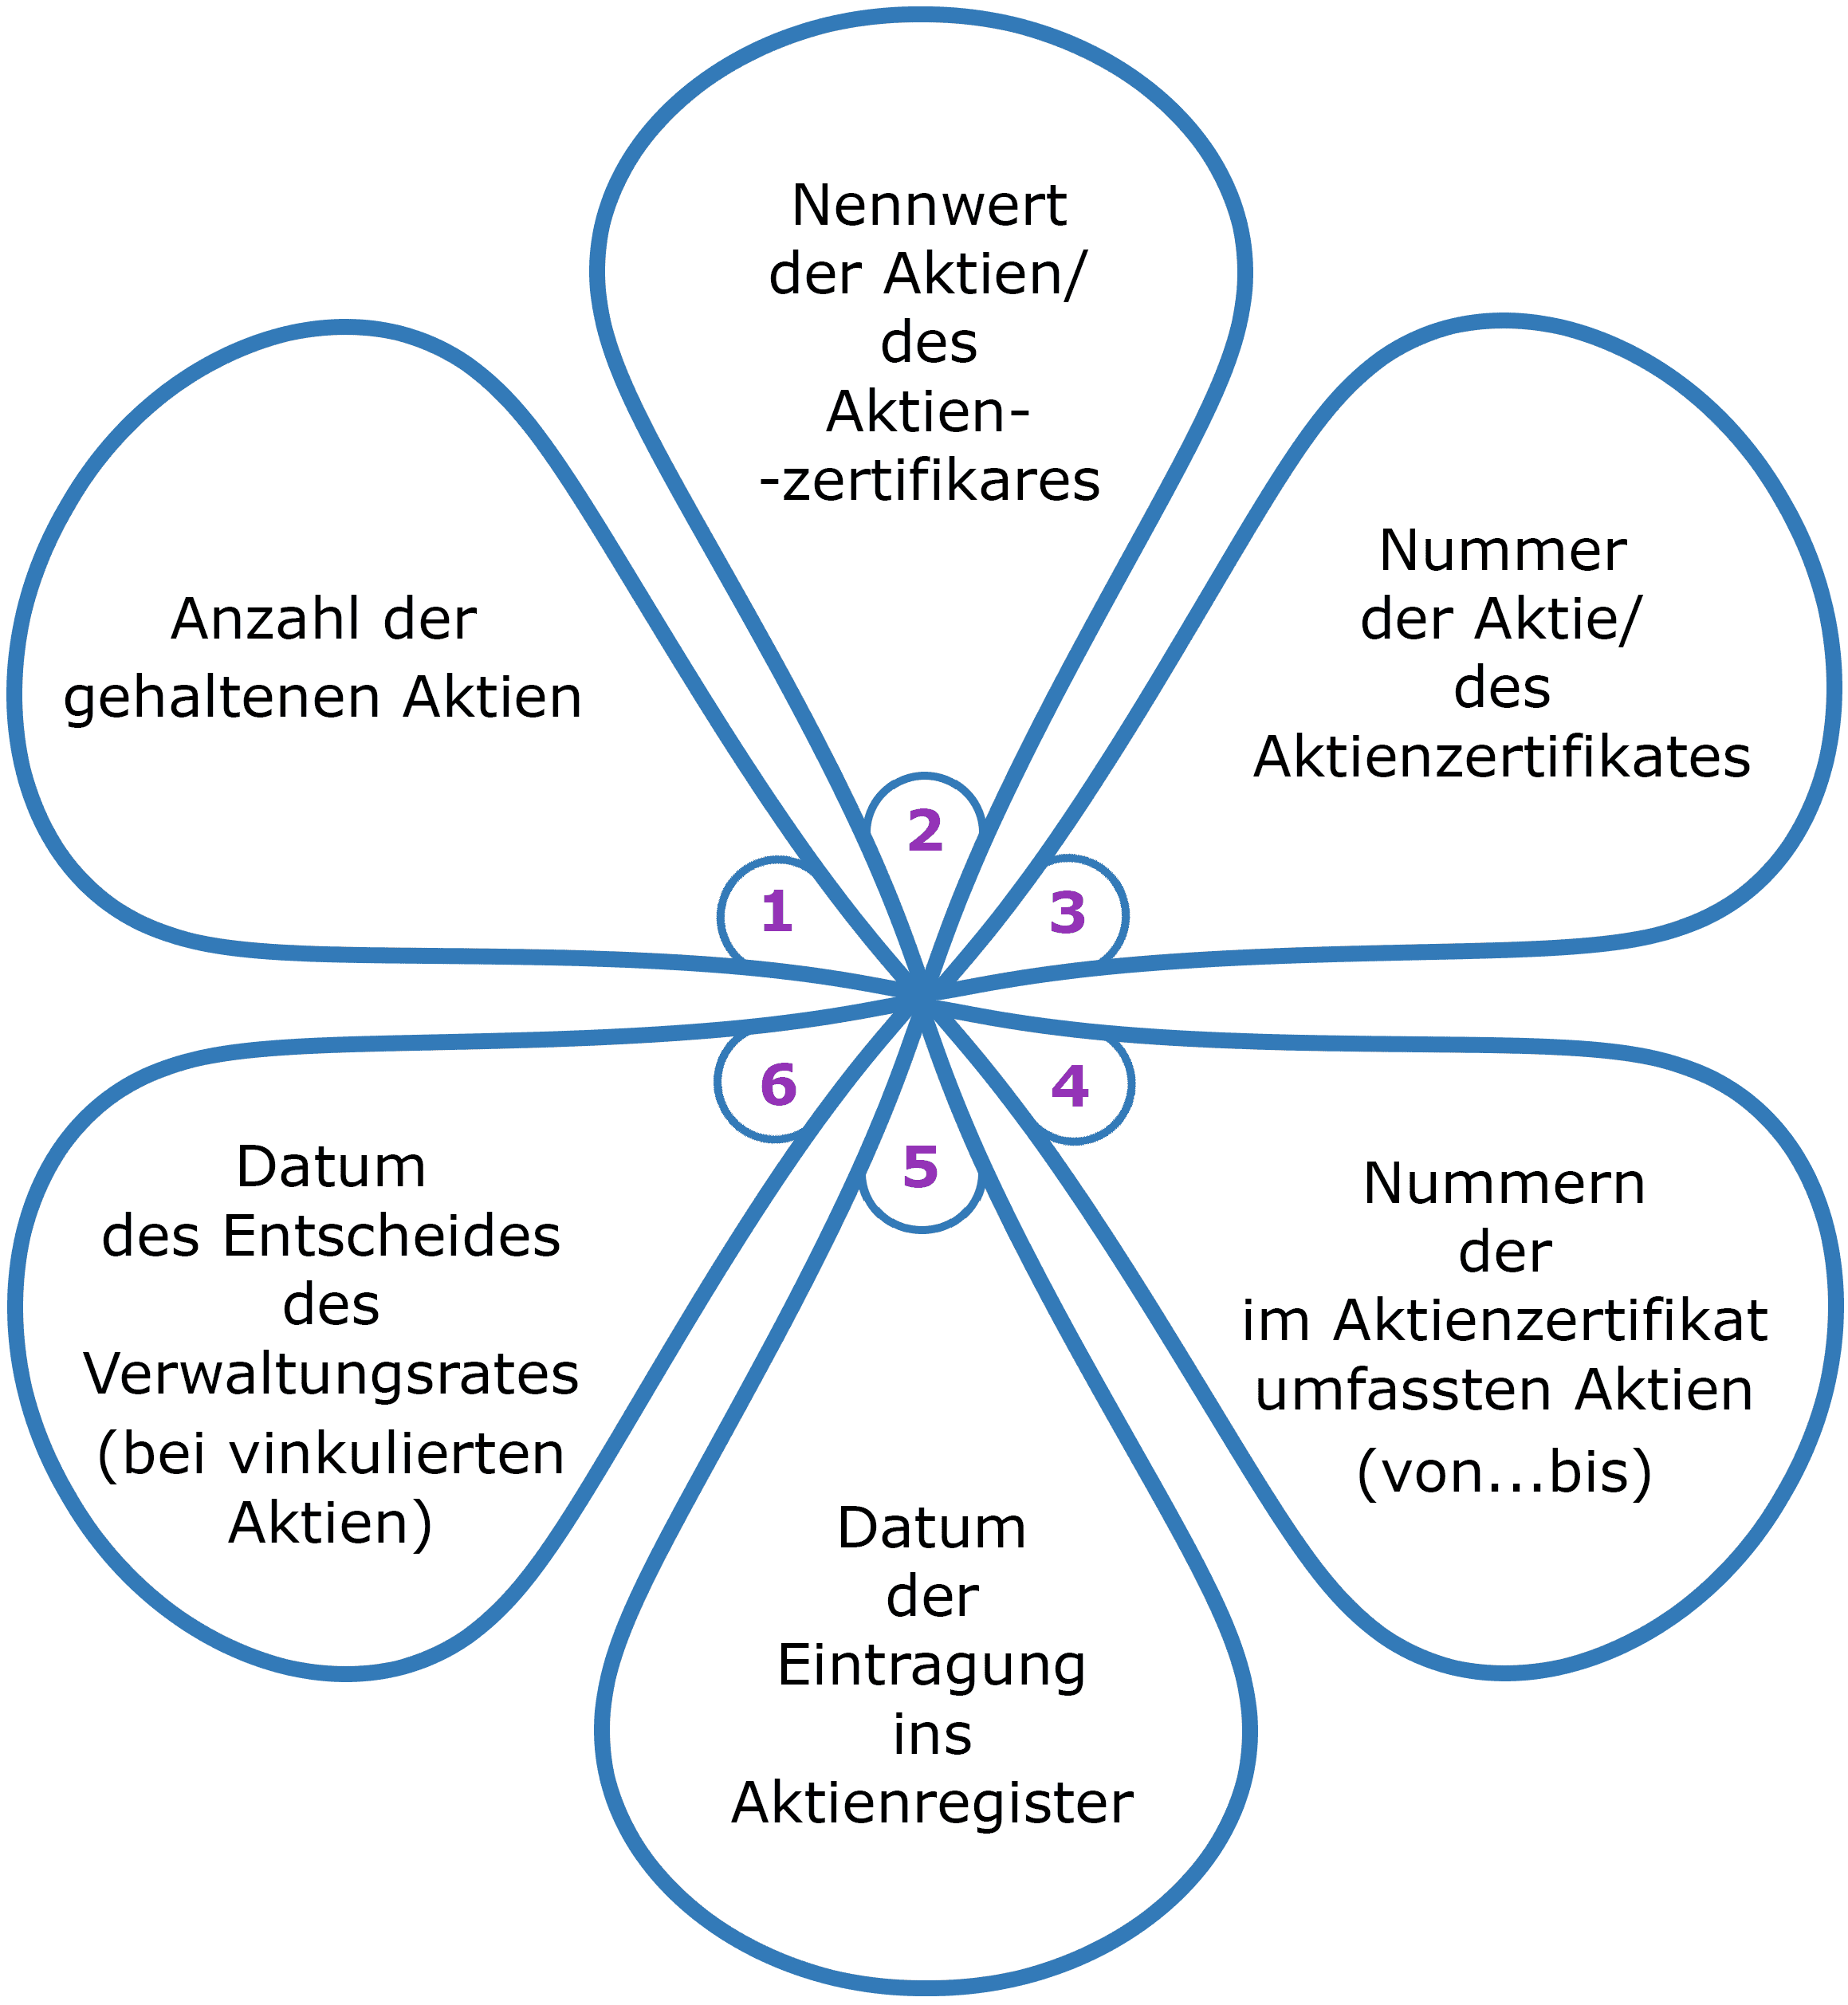 Binär Erklärung